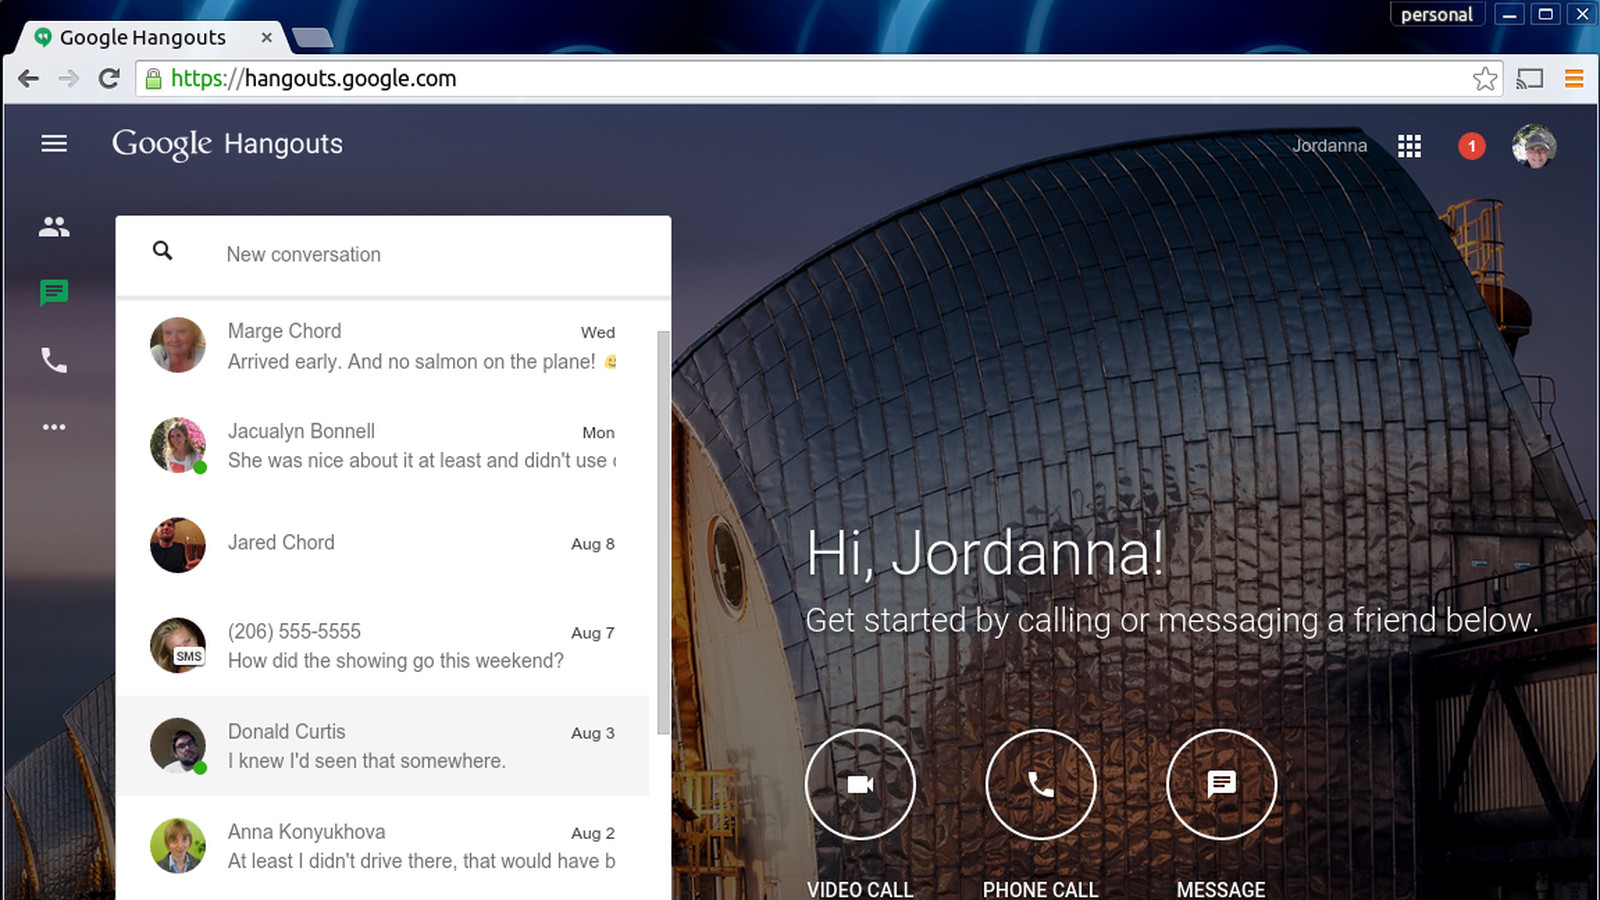 Google hangouts client for windows phone 8 - Google Hangouts Client For Windows Phone 8 35